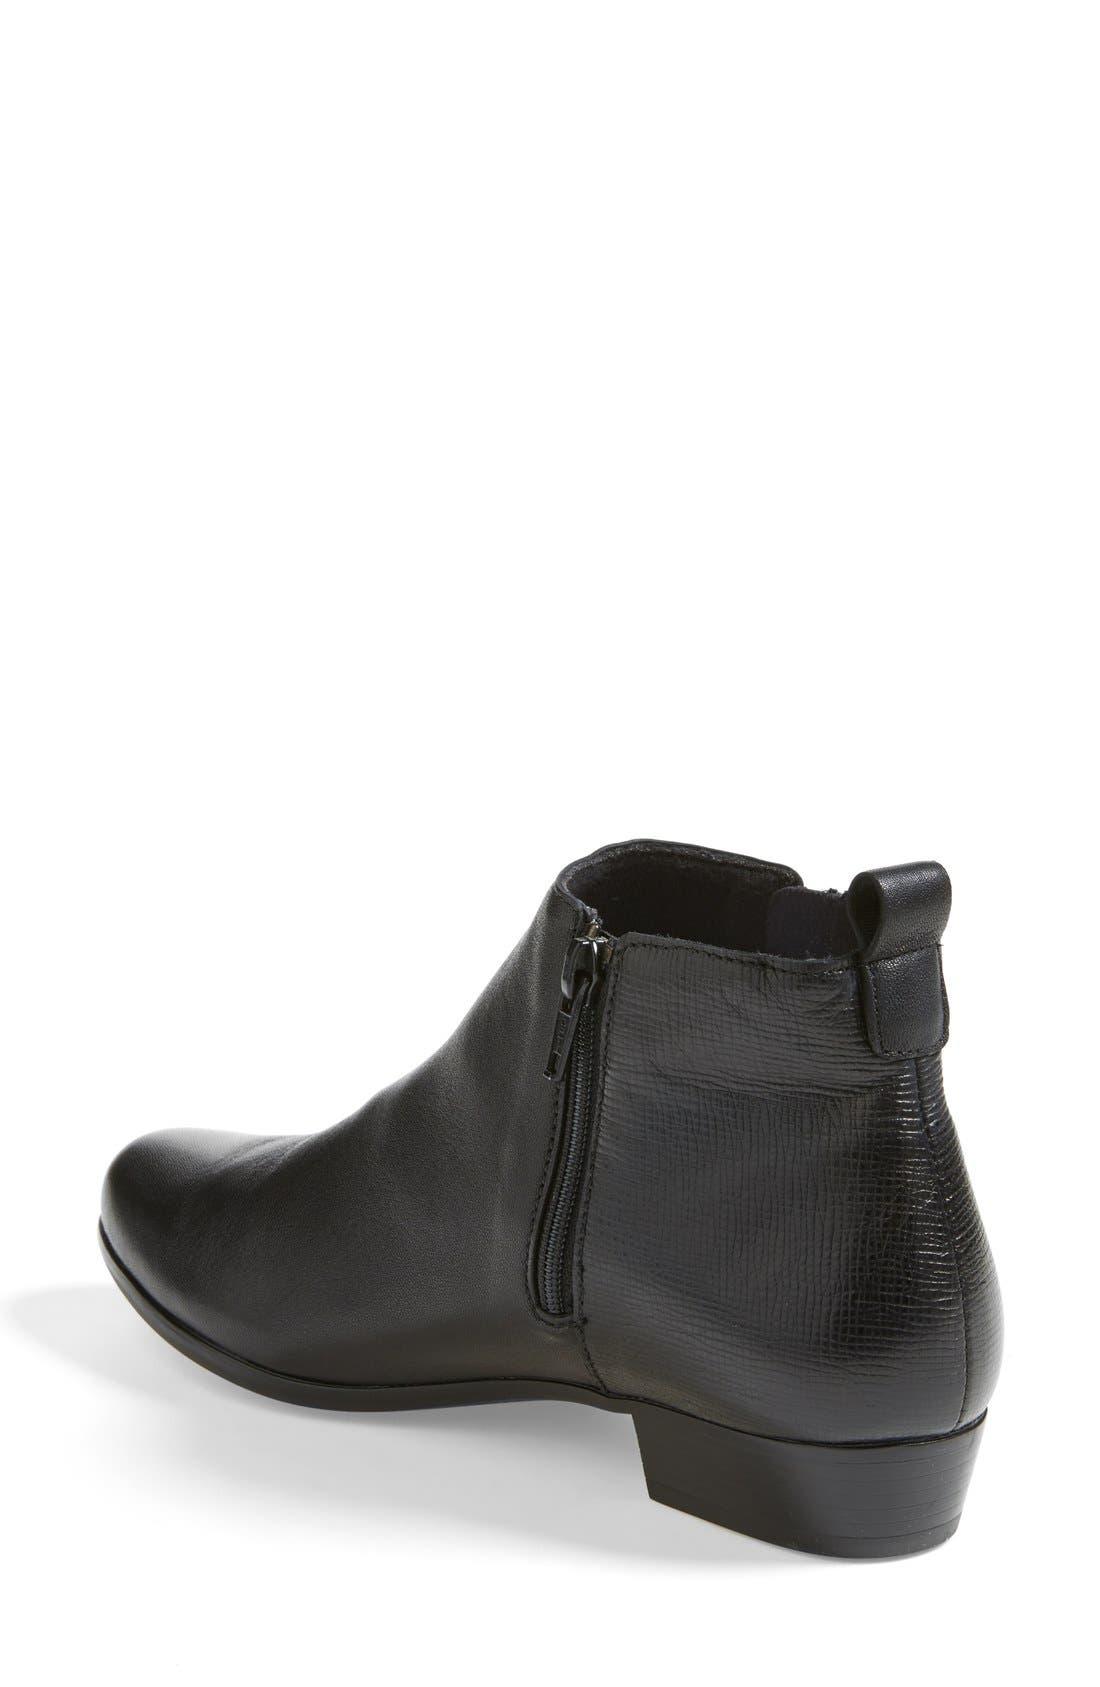 'Lexi' Boot,                             Alternate thumbnail 2, color,                             Black Leather